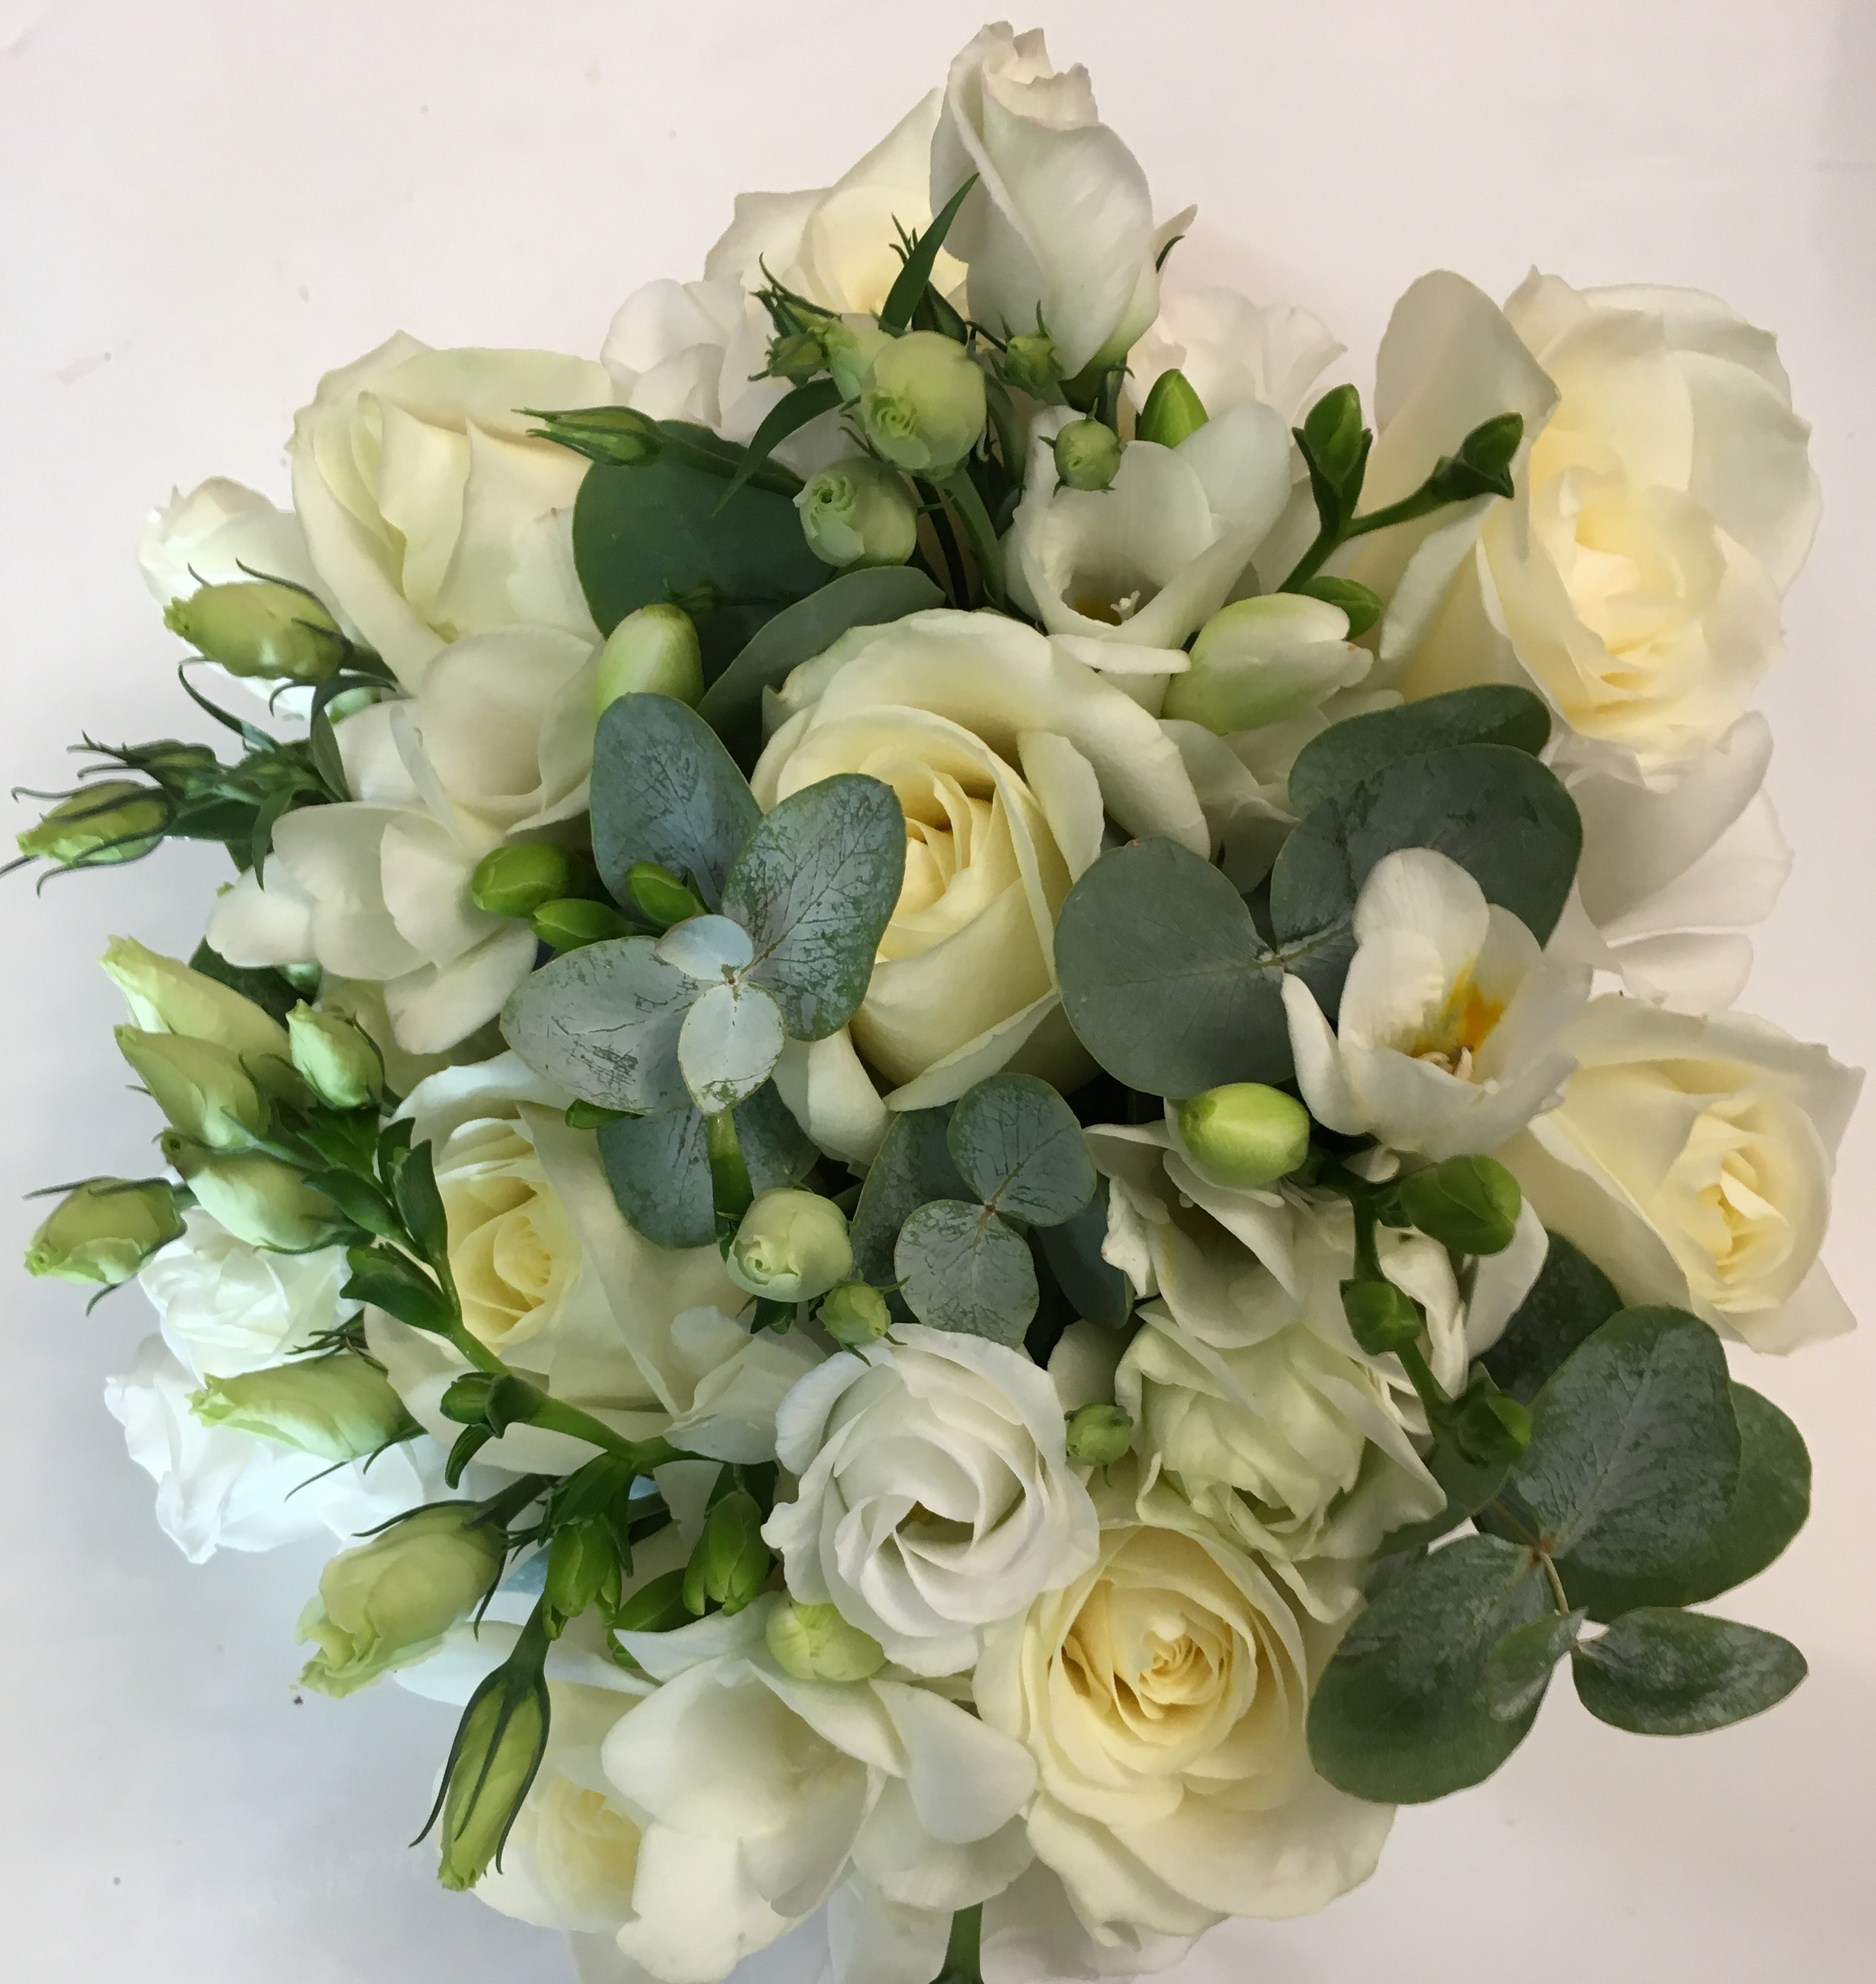 ivory roses & freesia with eucalyptus & lisianthus